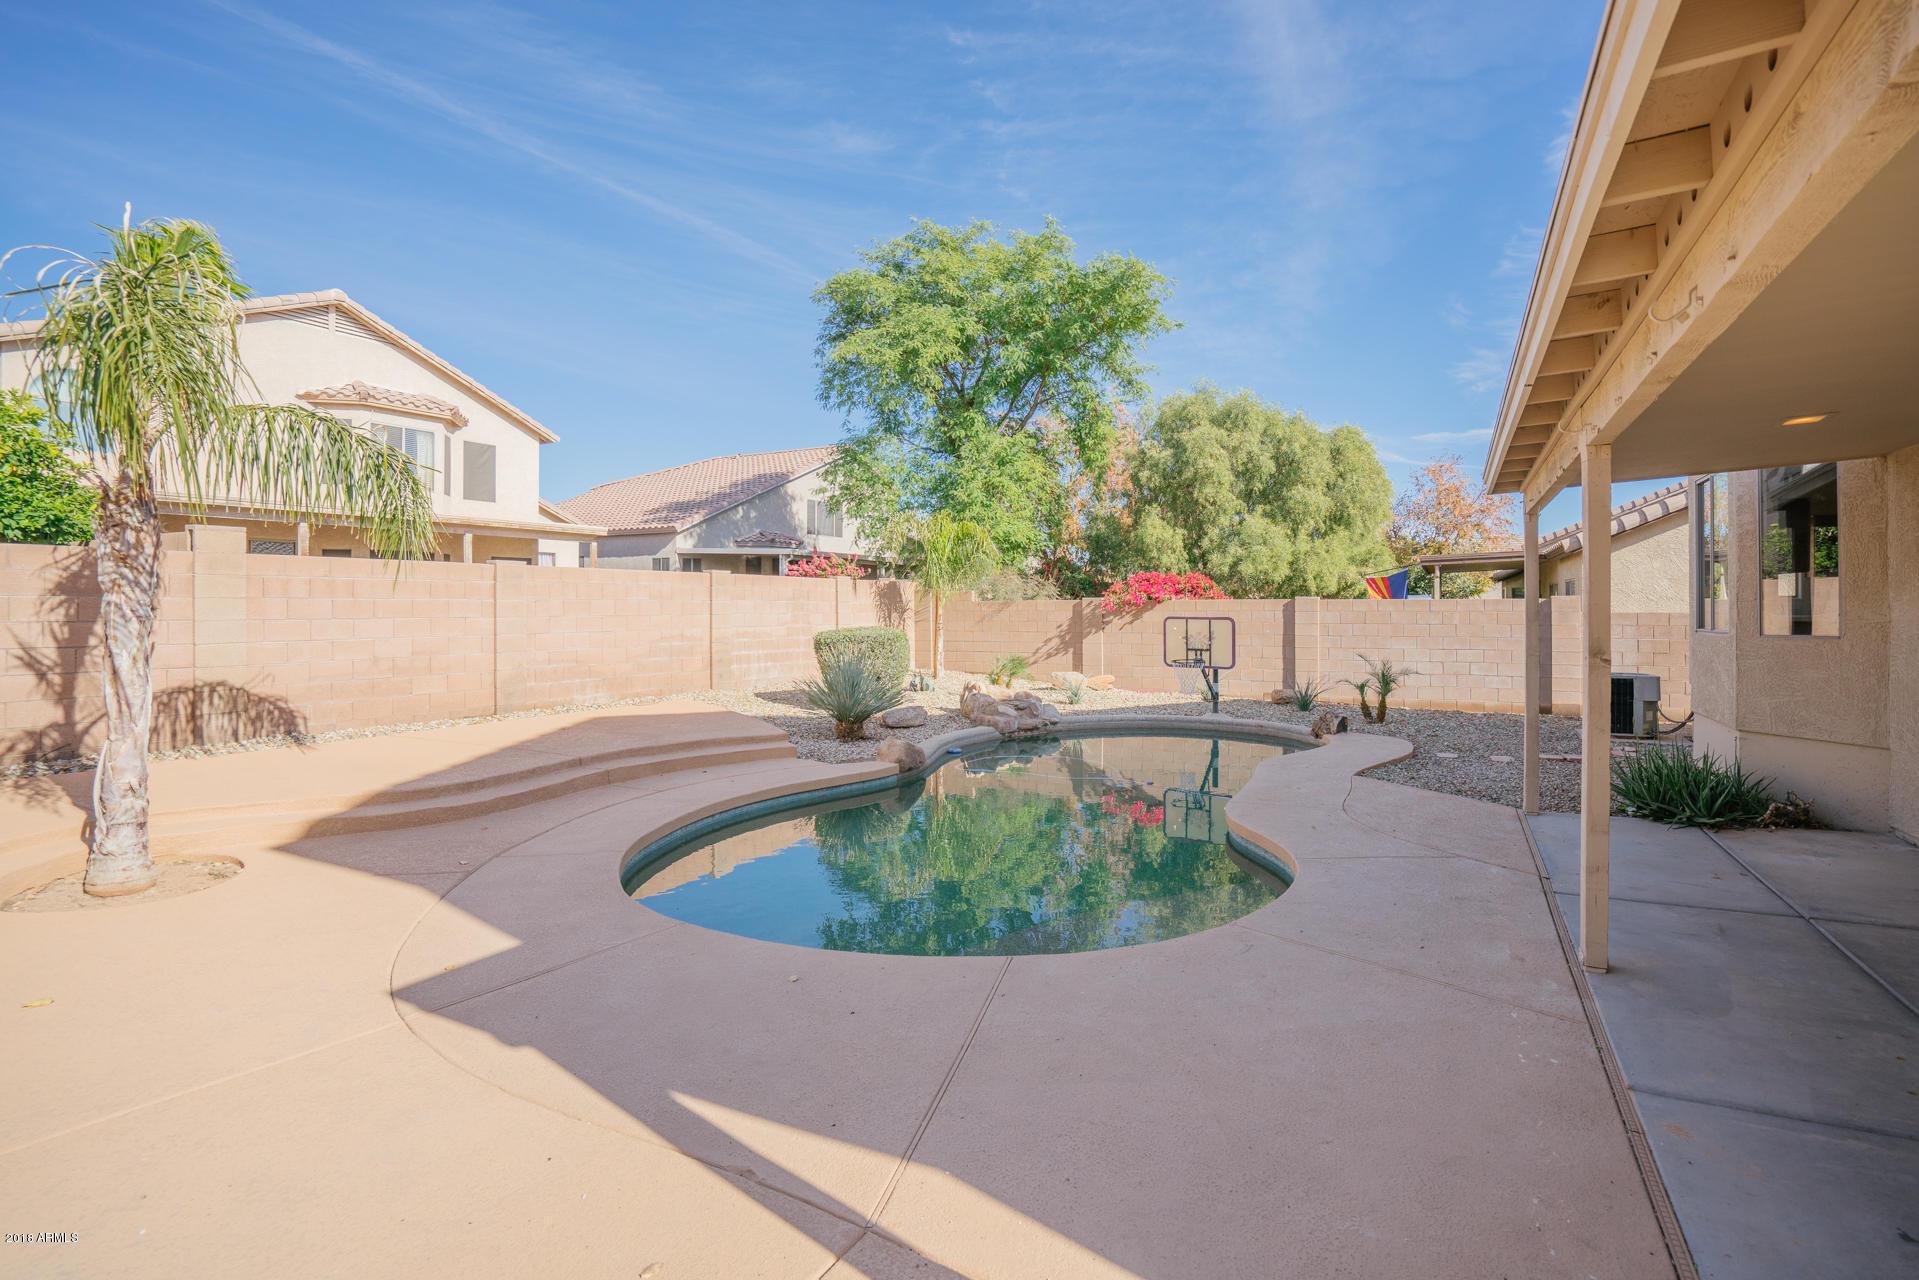 MLS 5860306 12922 W SURREY Avenue, El Mirage, AZ 85335 El Mirage AZ Private Pool